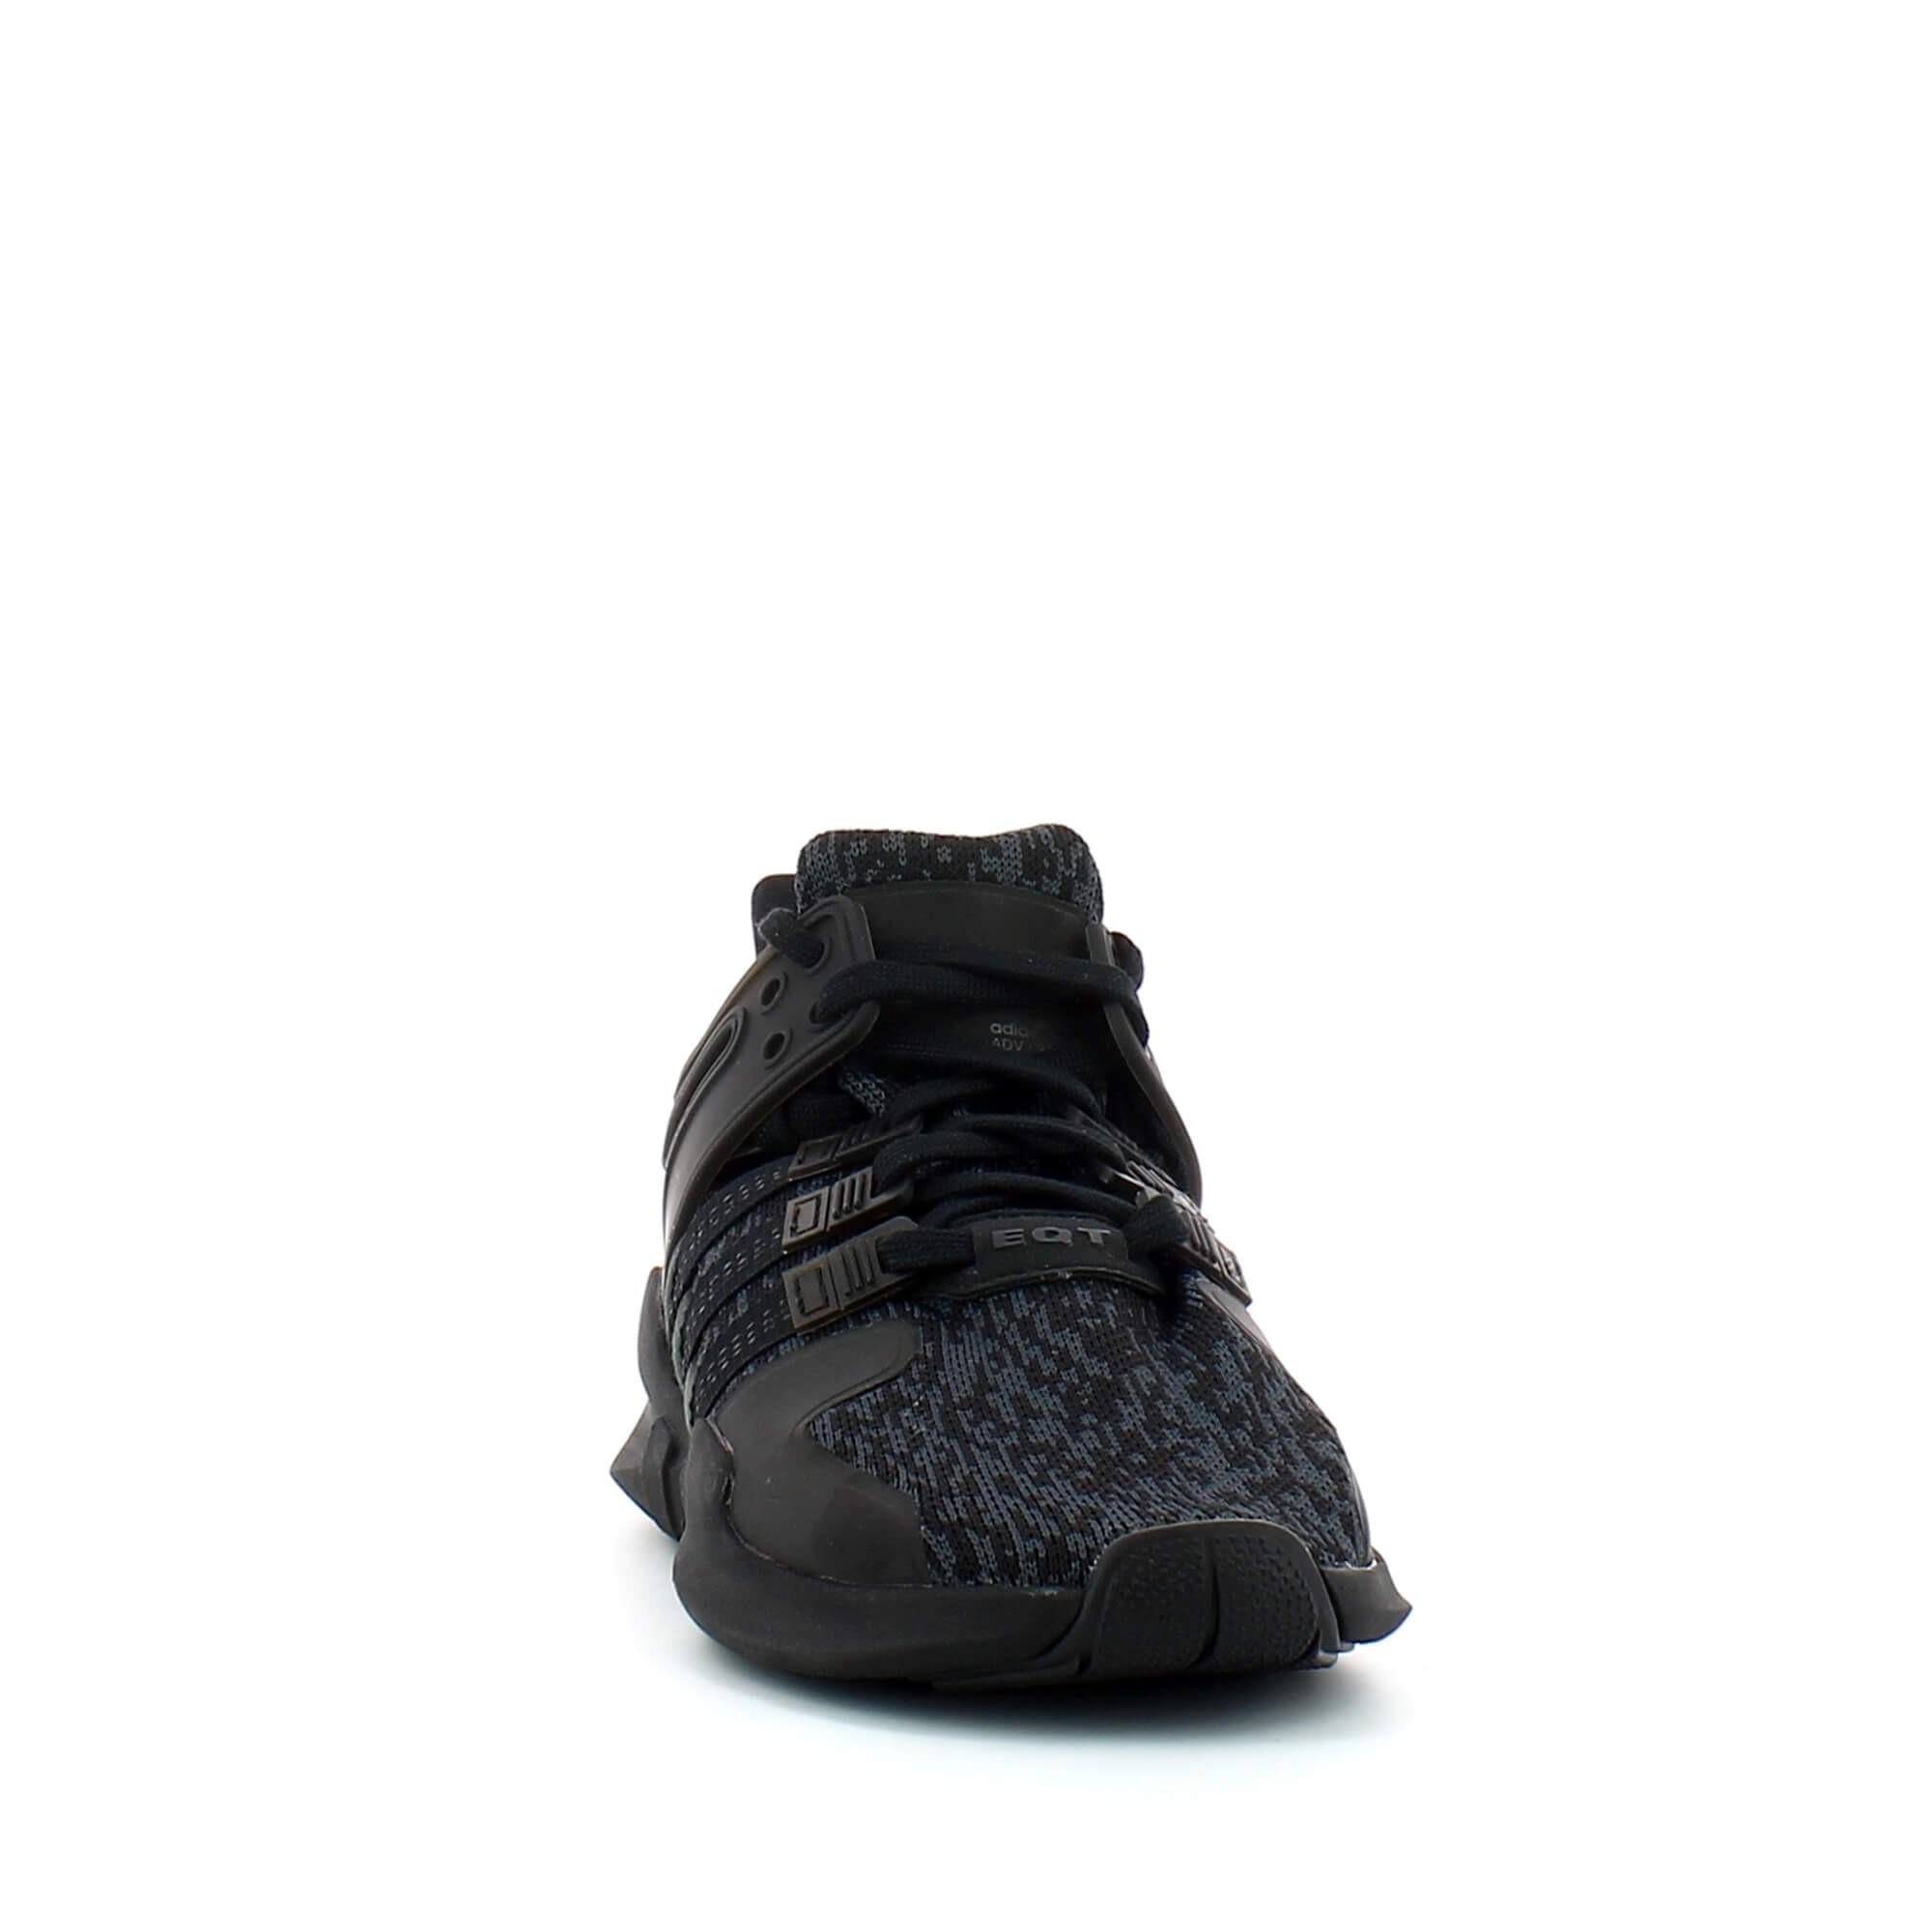 detailed look d2254 e9280 Zapatillas Adidas Eqt Support Adv Negro Hombre - Deportes Moya